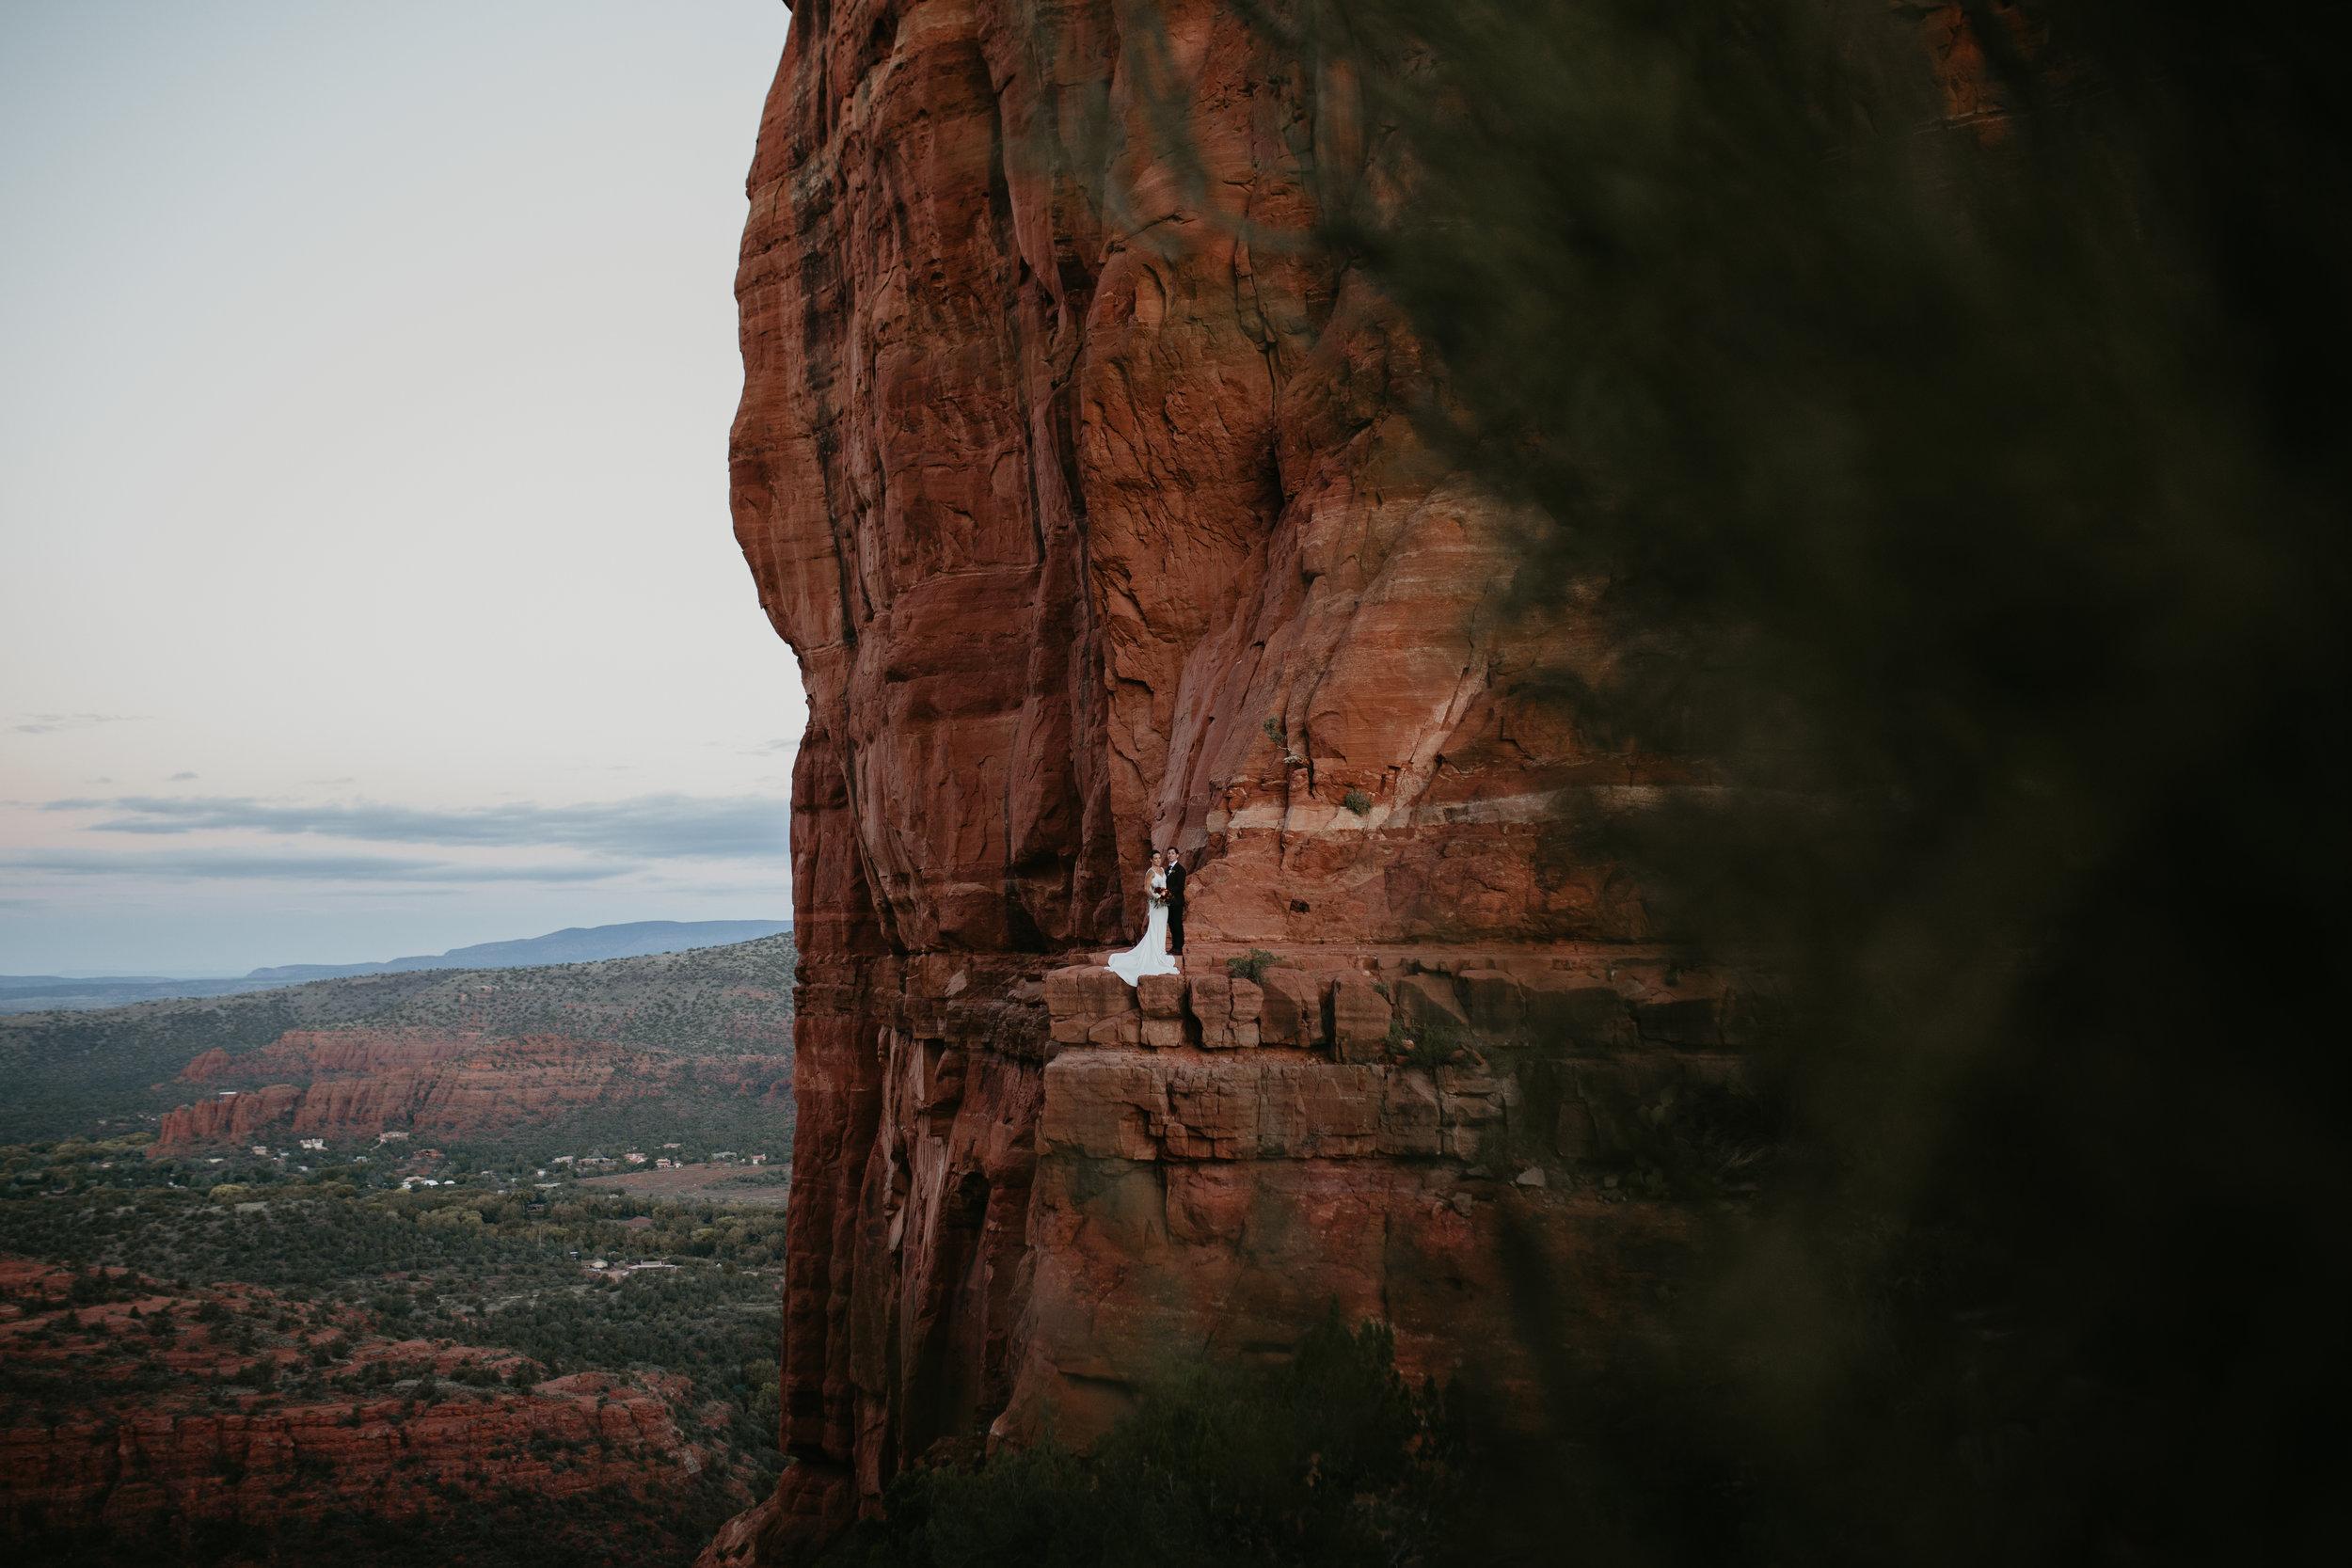 nicole-daacke-photography-sedona-arizona-destination-elopement-wedding-photographer-catherdral-rock-hiking-elopement-sedona-river-elopement-photos-desert-rock-wedding-photographer-laid-back-spontaneous-elopement-21.jpg